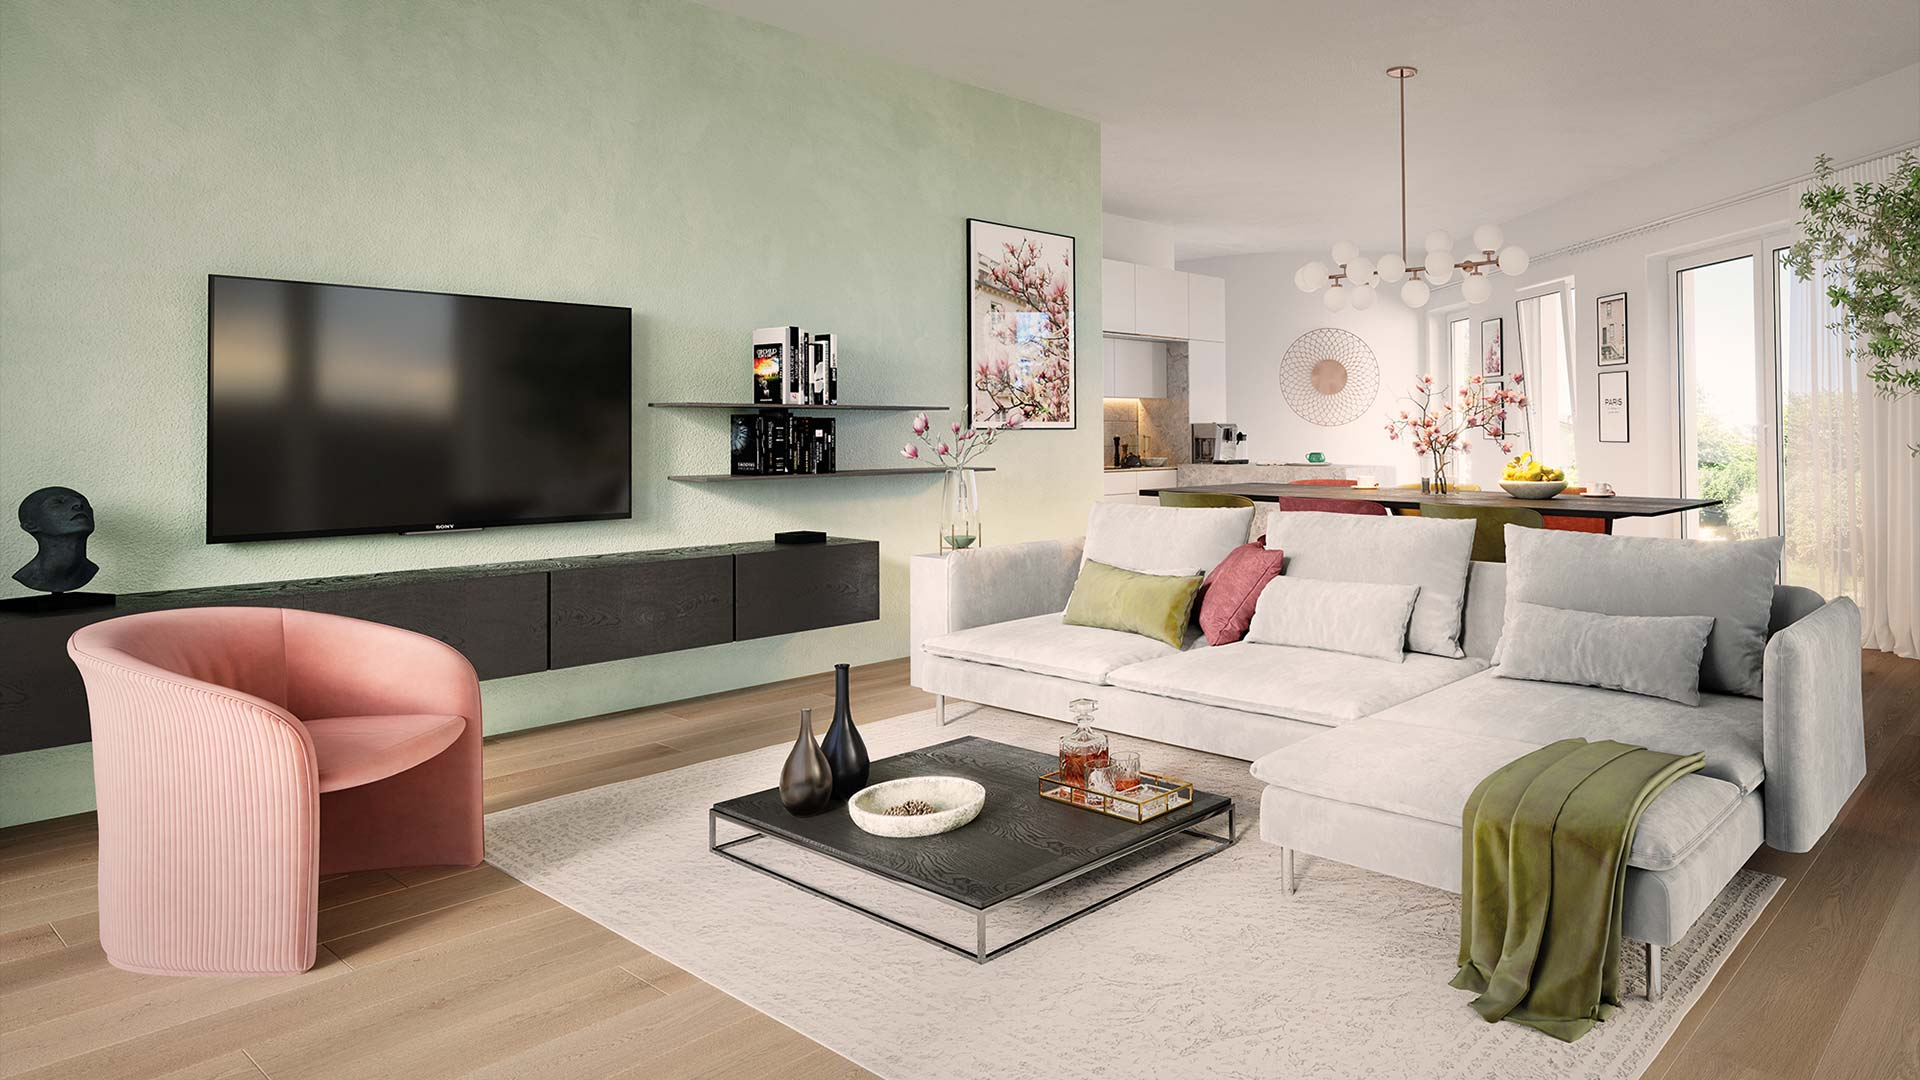 Immobilienmarketing Magnolia Visualisierung